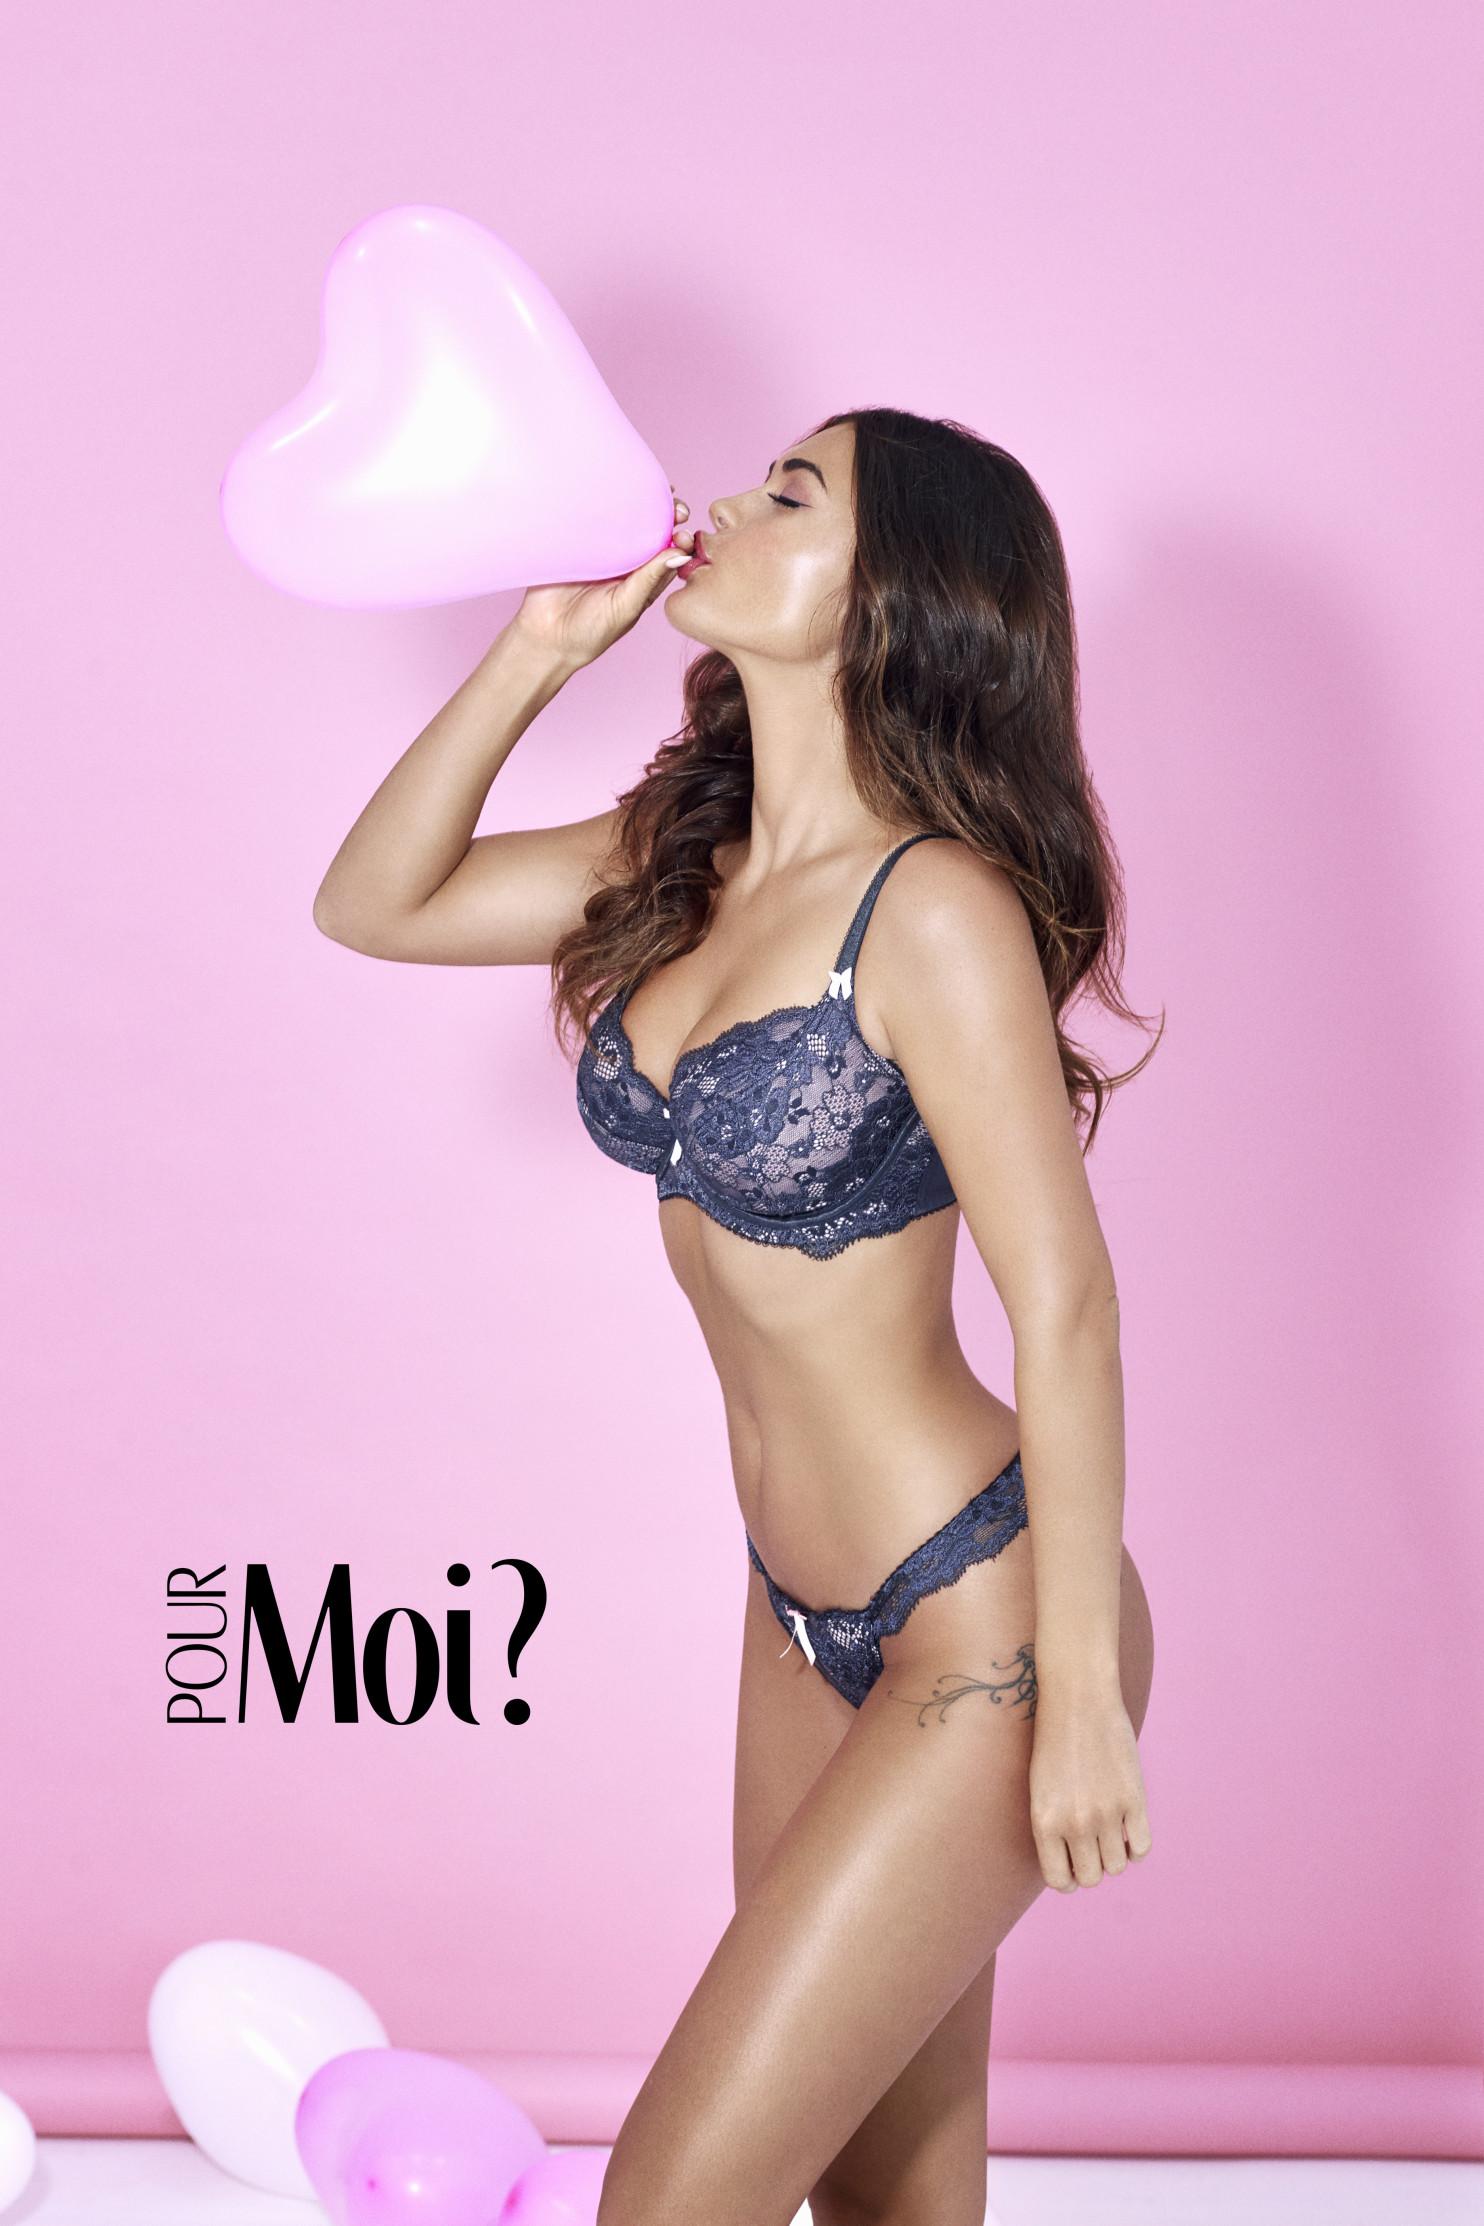 lingerie-photographer-campaign-pink-shoot-1484x2226.jpg